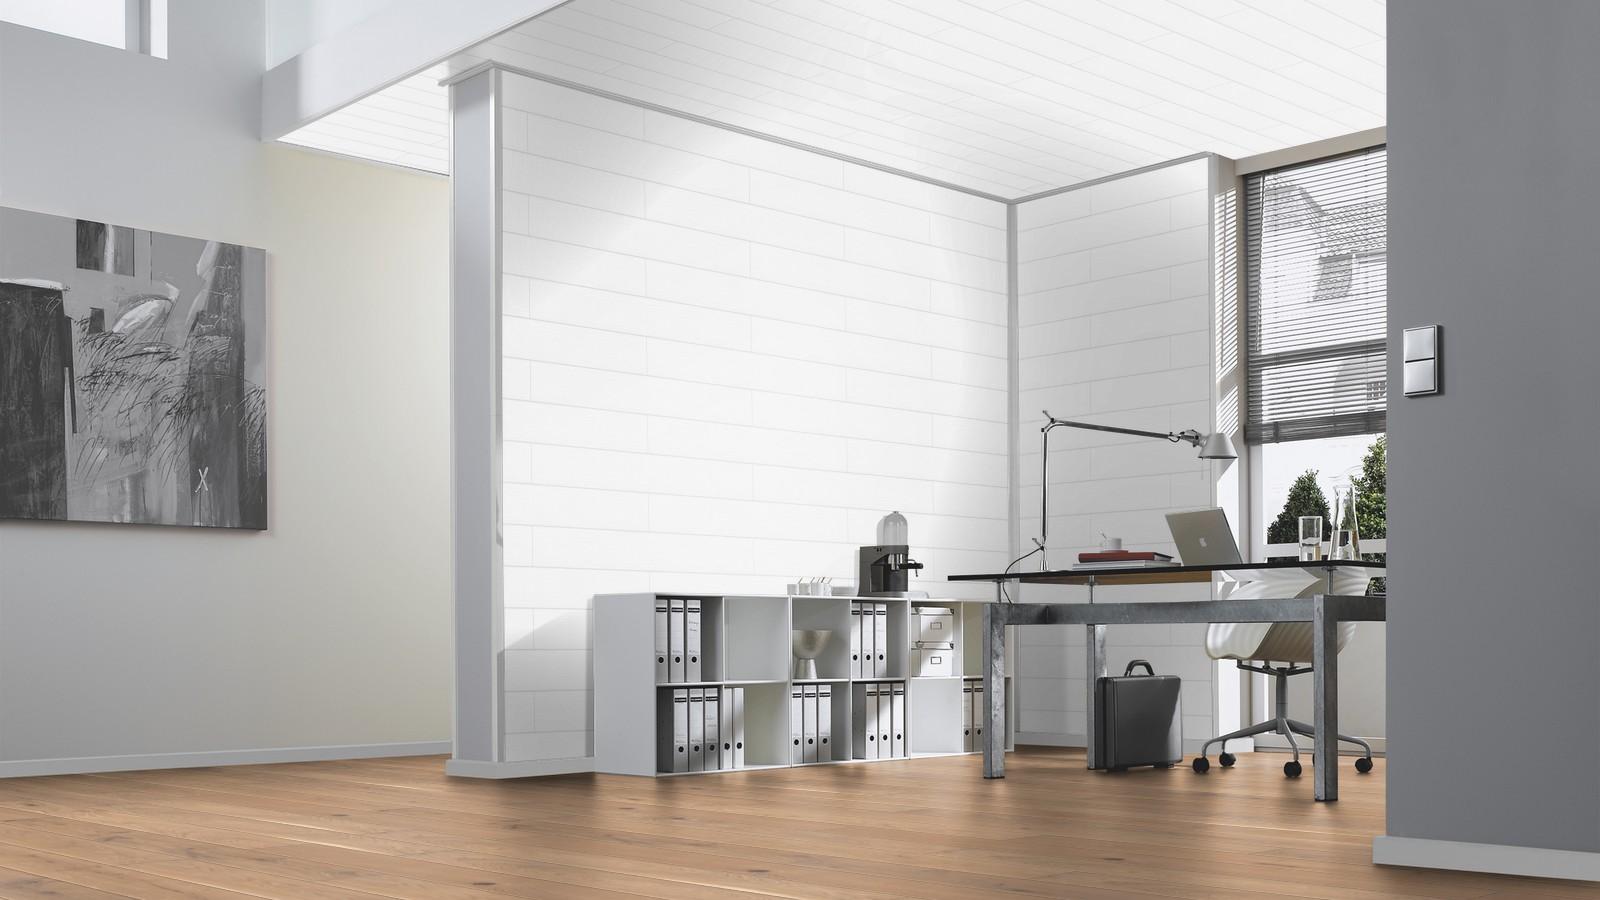 ter h rne bright collection l parkett l b03 eiche lichtbeige l landhausdiele preisbrecher. Black Bedroom Furniture Sets. Home Design Ideas